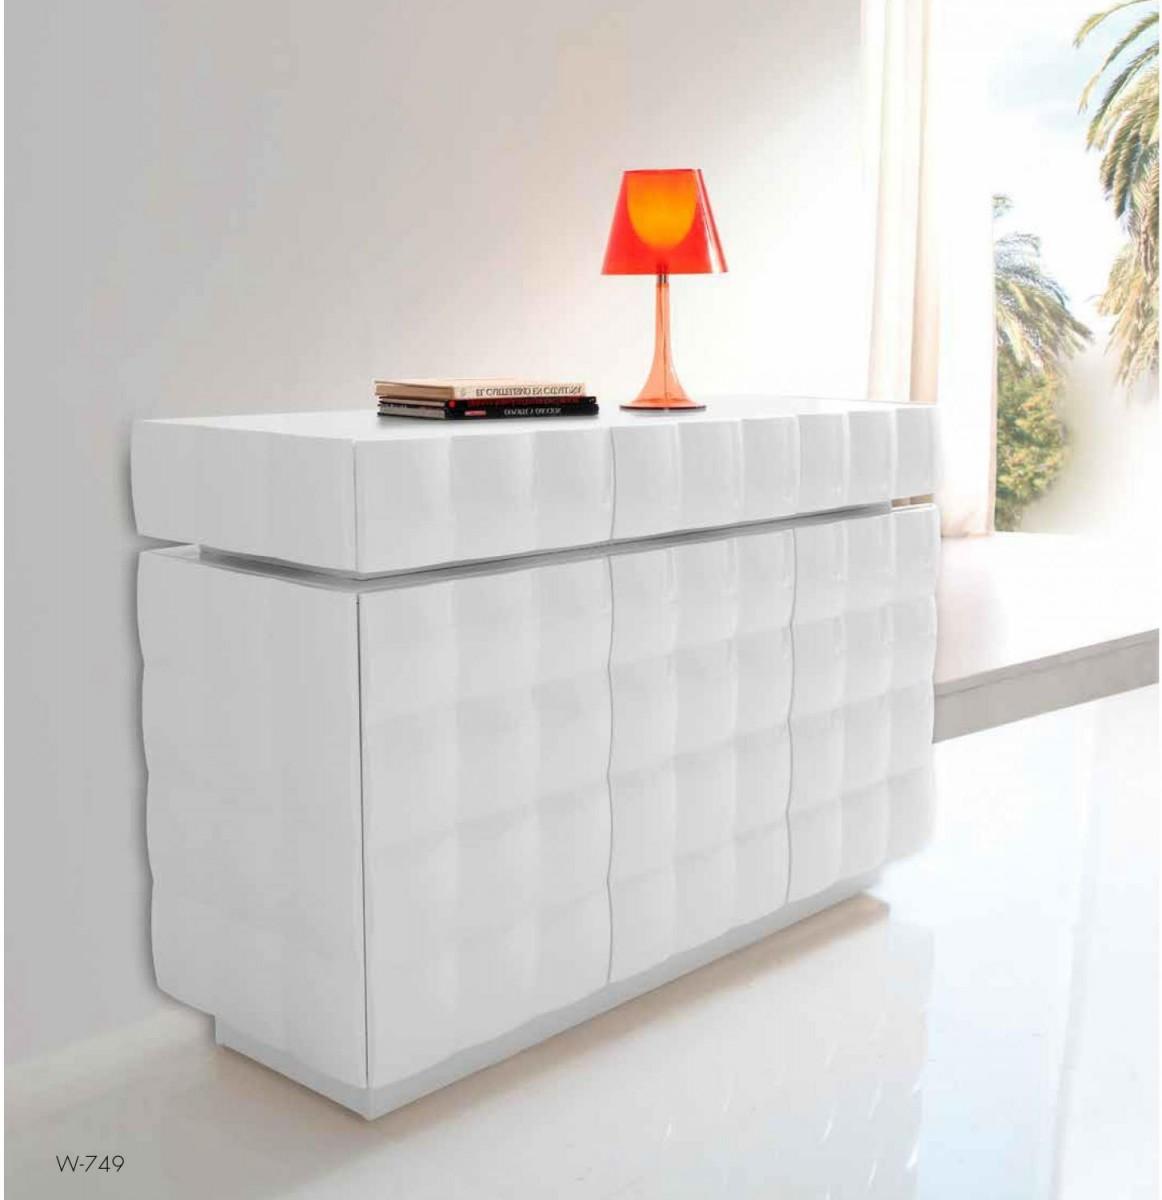 Tienda de sofas en valencia sofas outlet for Muebles candela valencia